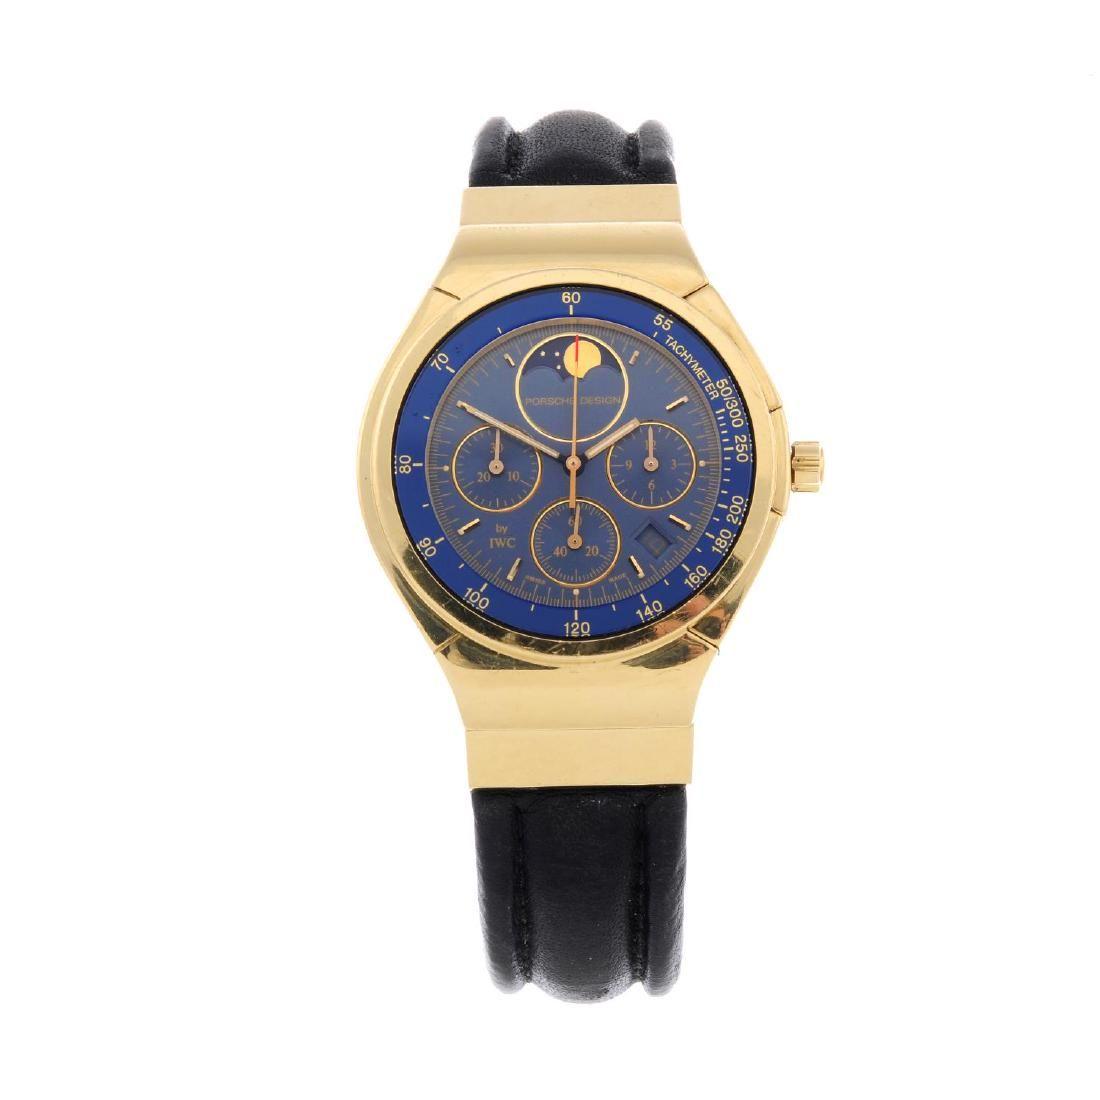 PORSCHE DESIGN BY IWC - a gentleman's chronograph wrist